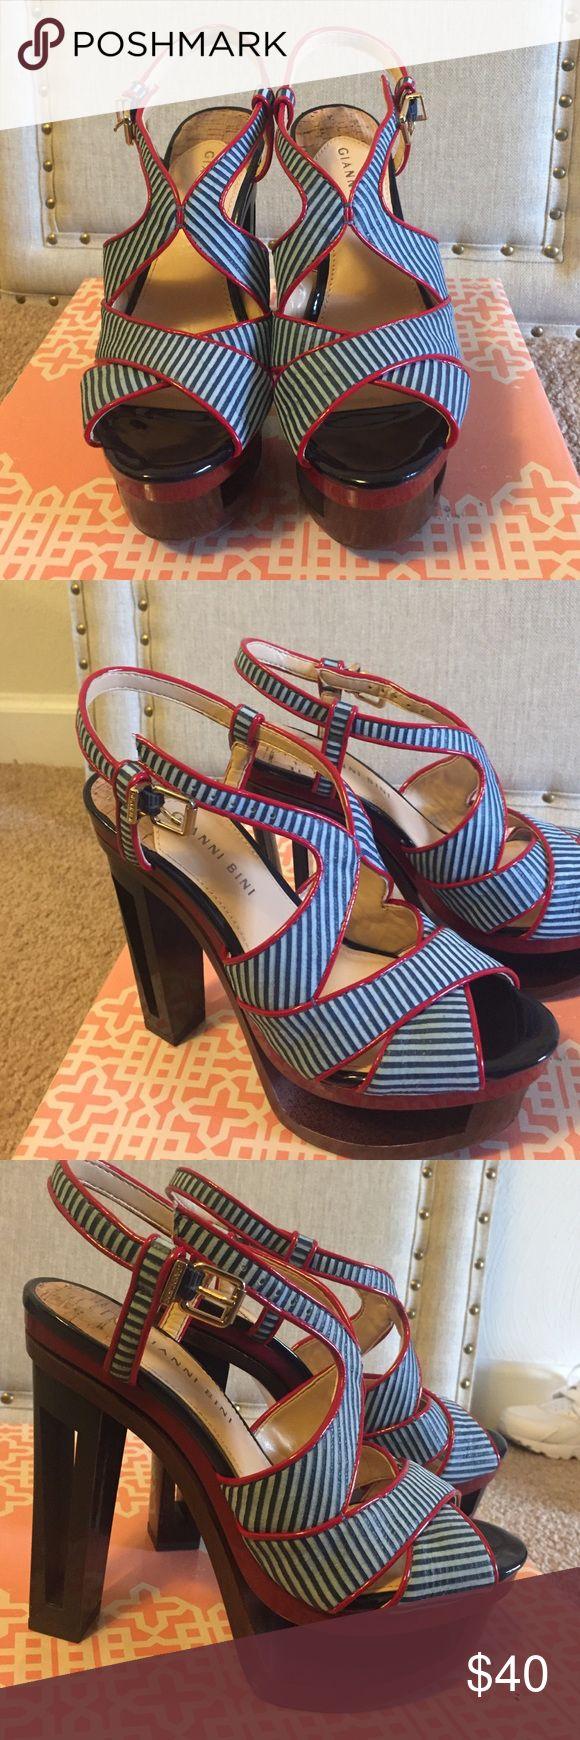 Gianni Bini platform heels! Sexy Gianni Bini platform heels! Gianni Bini Shoes Heels